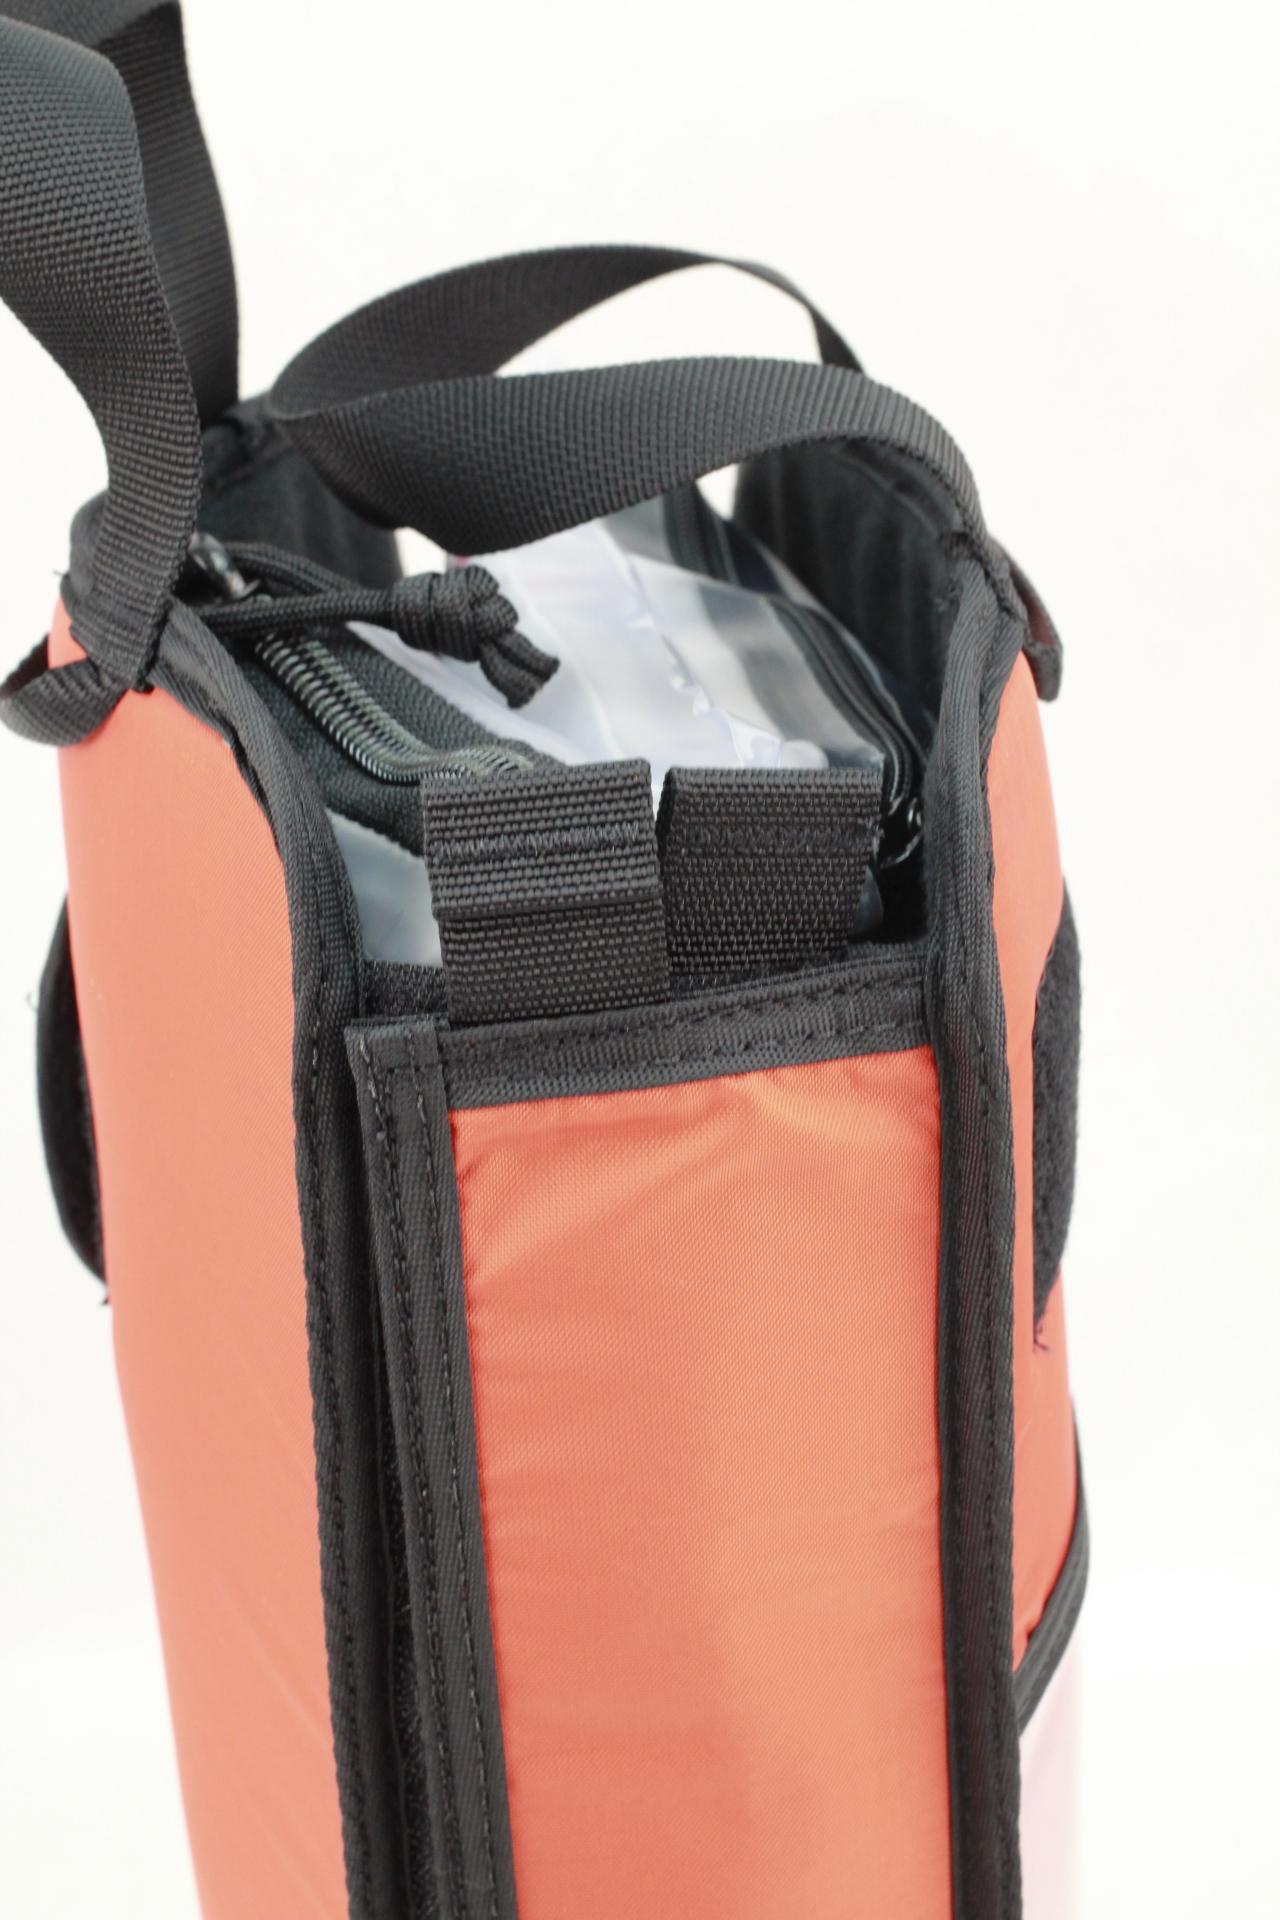 Large Civilian DASH bag binding edge view